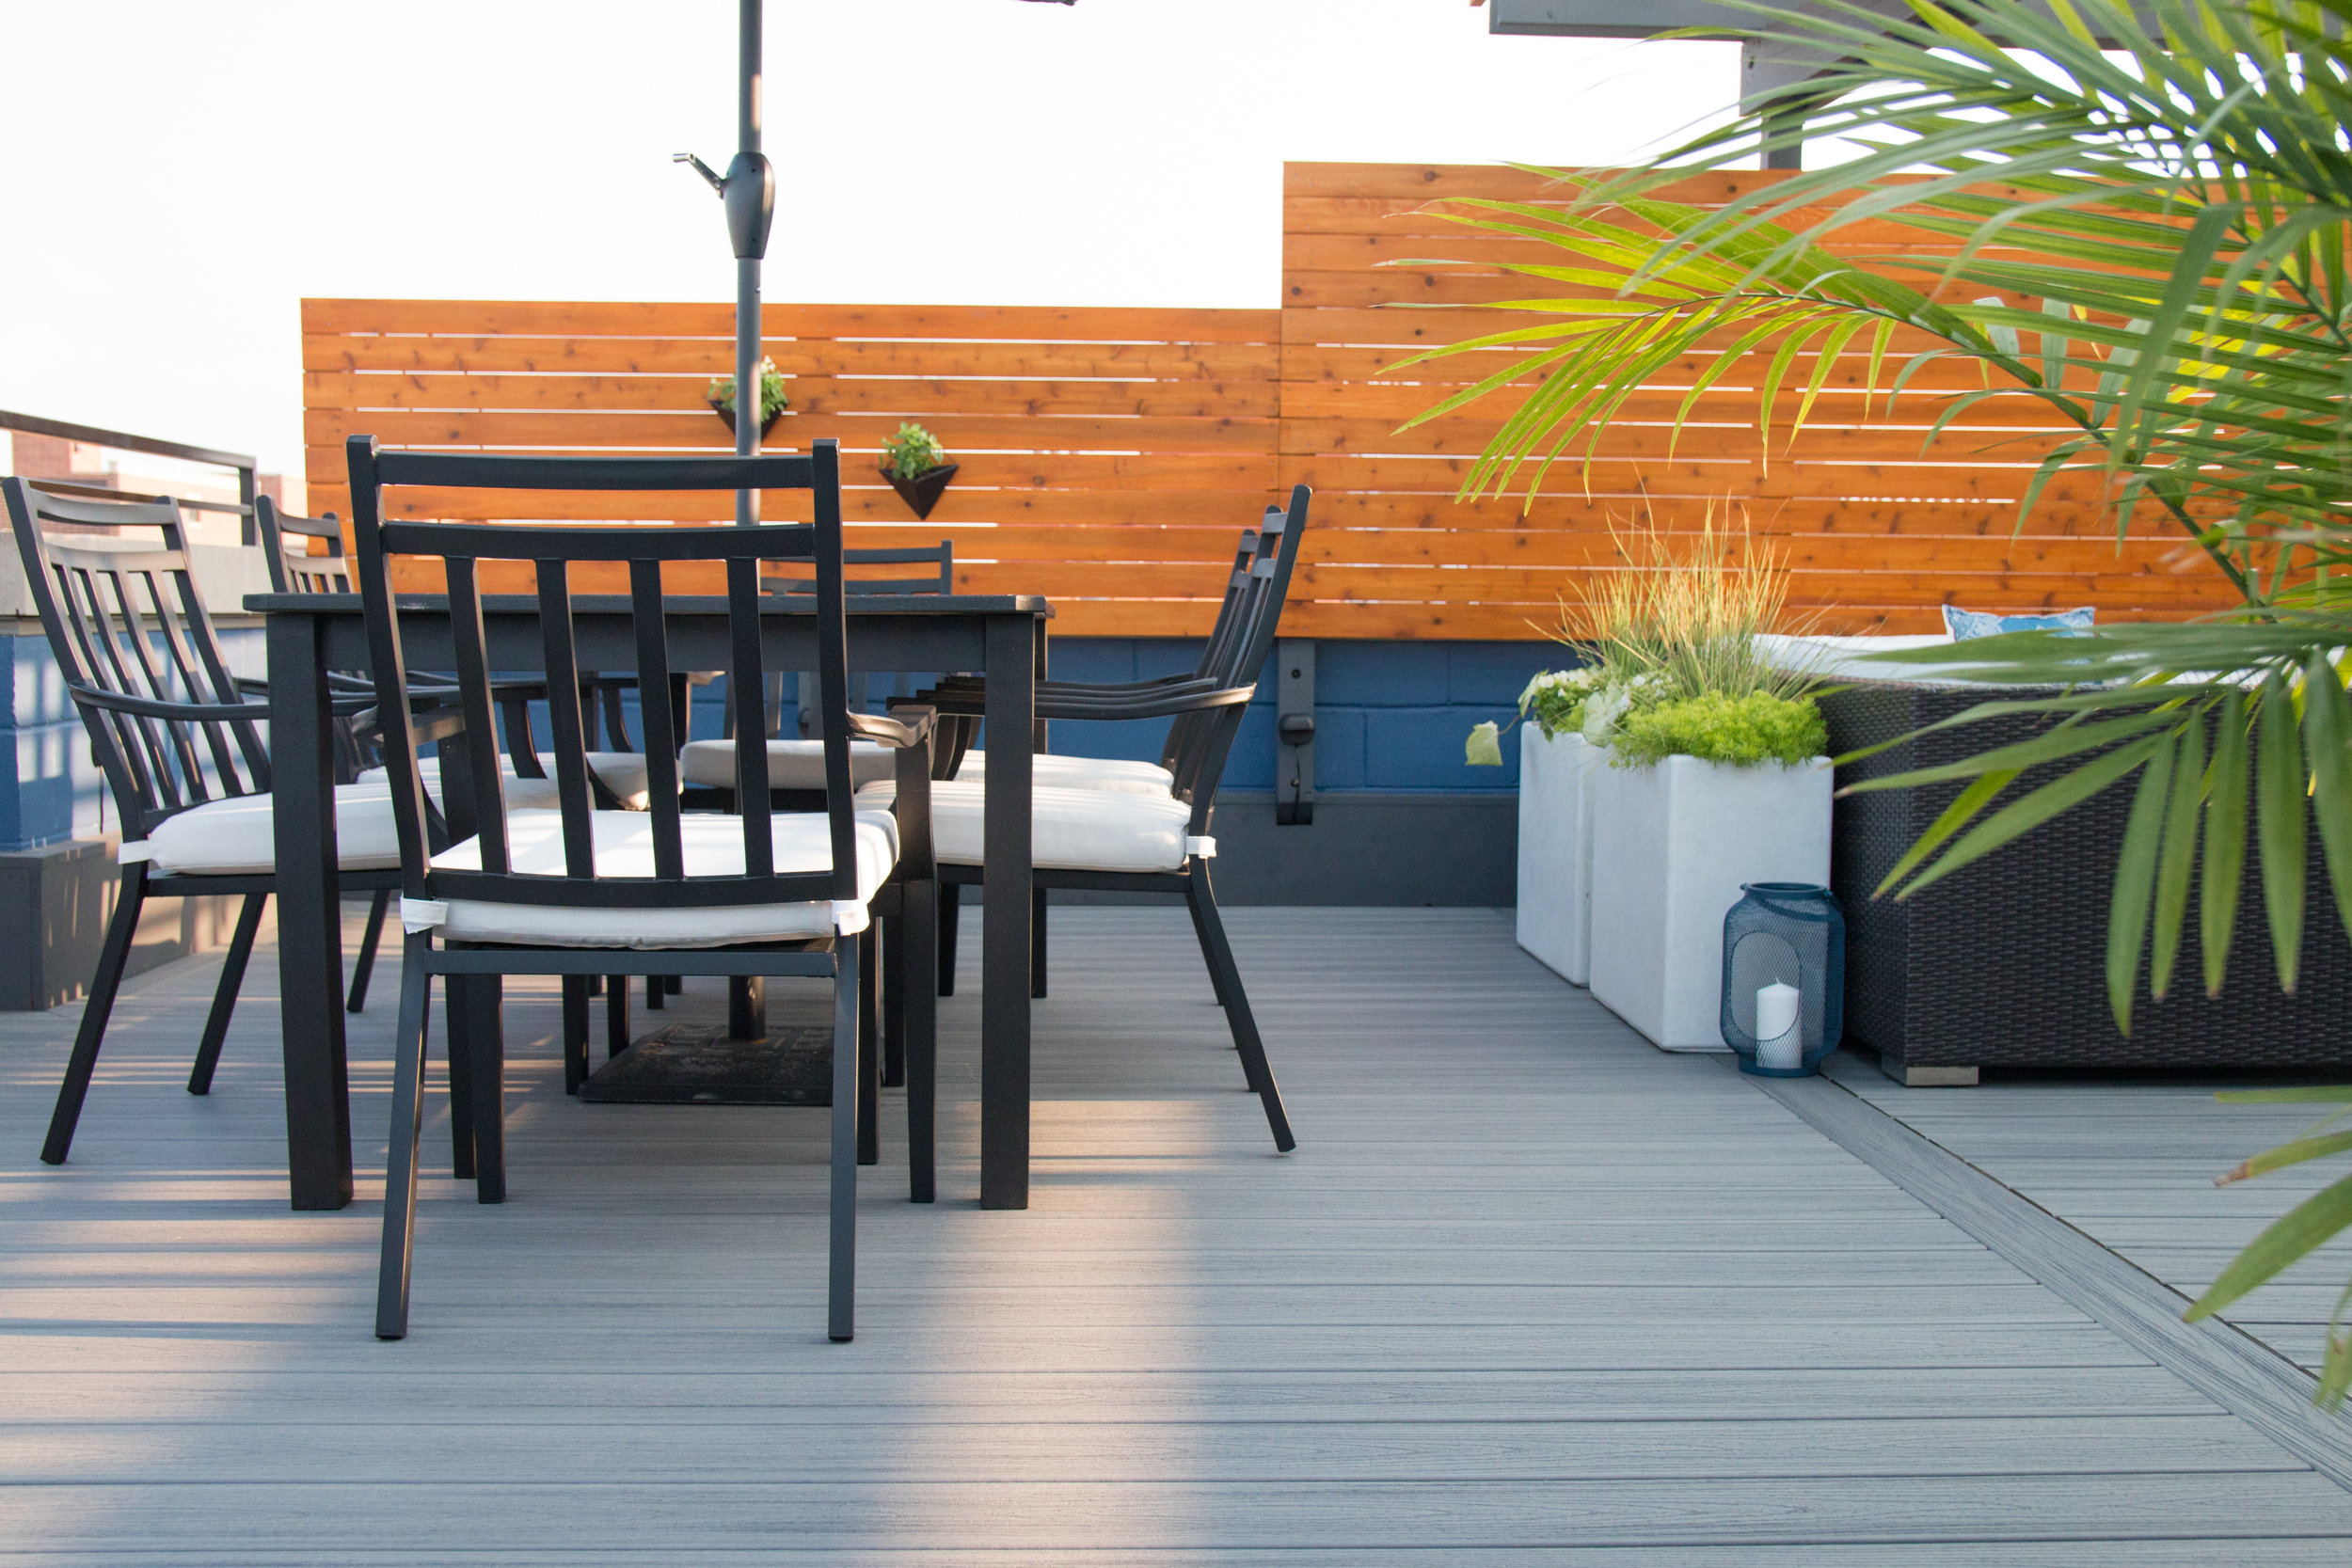 chicago roof deck design 2018